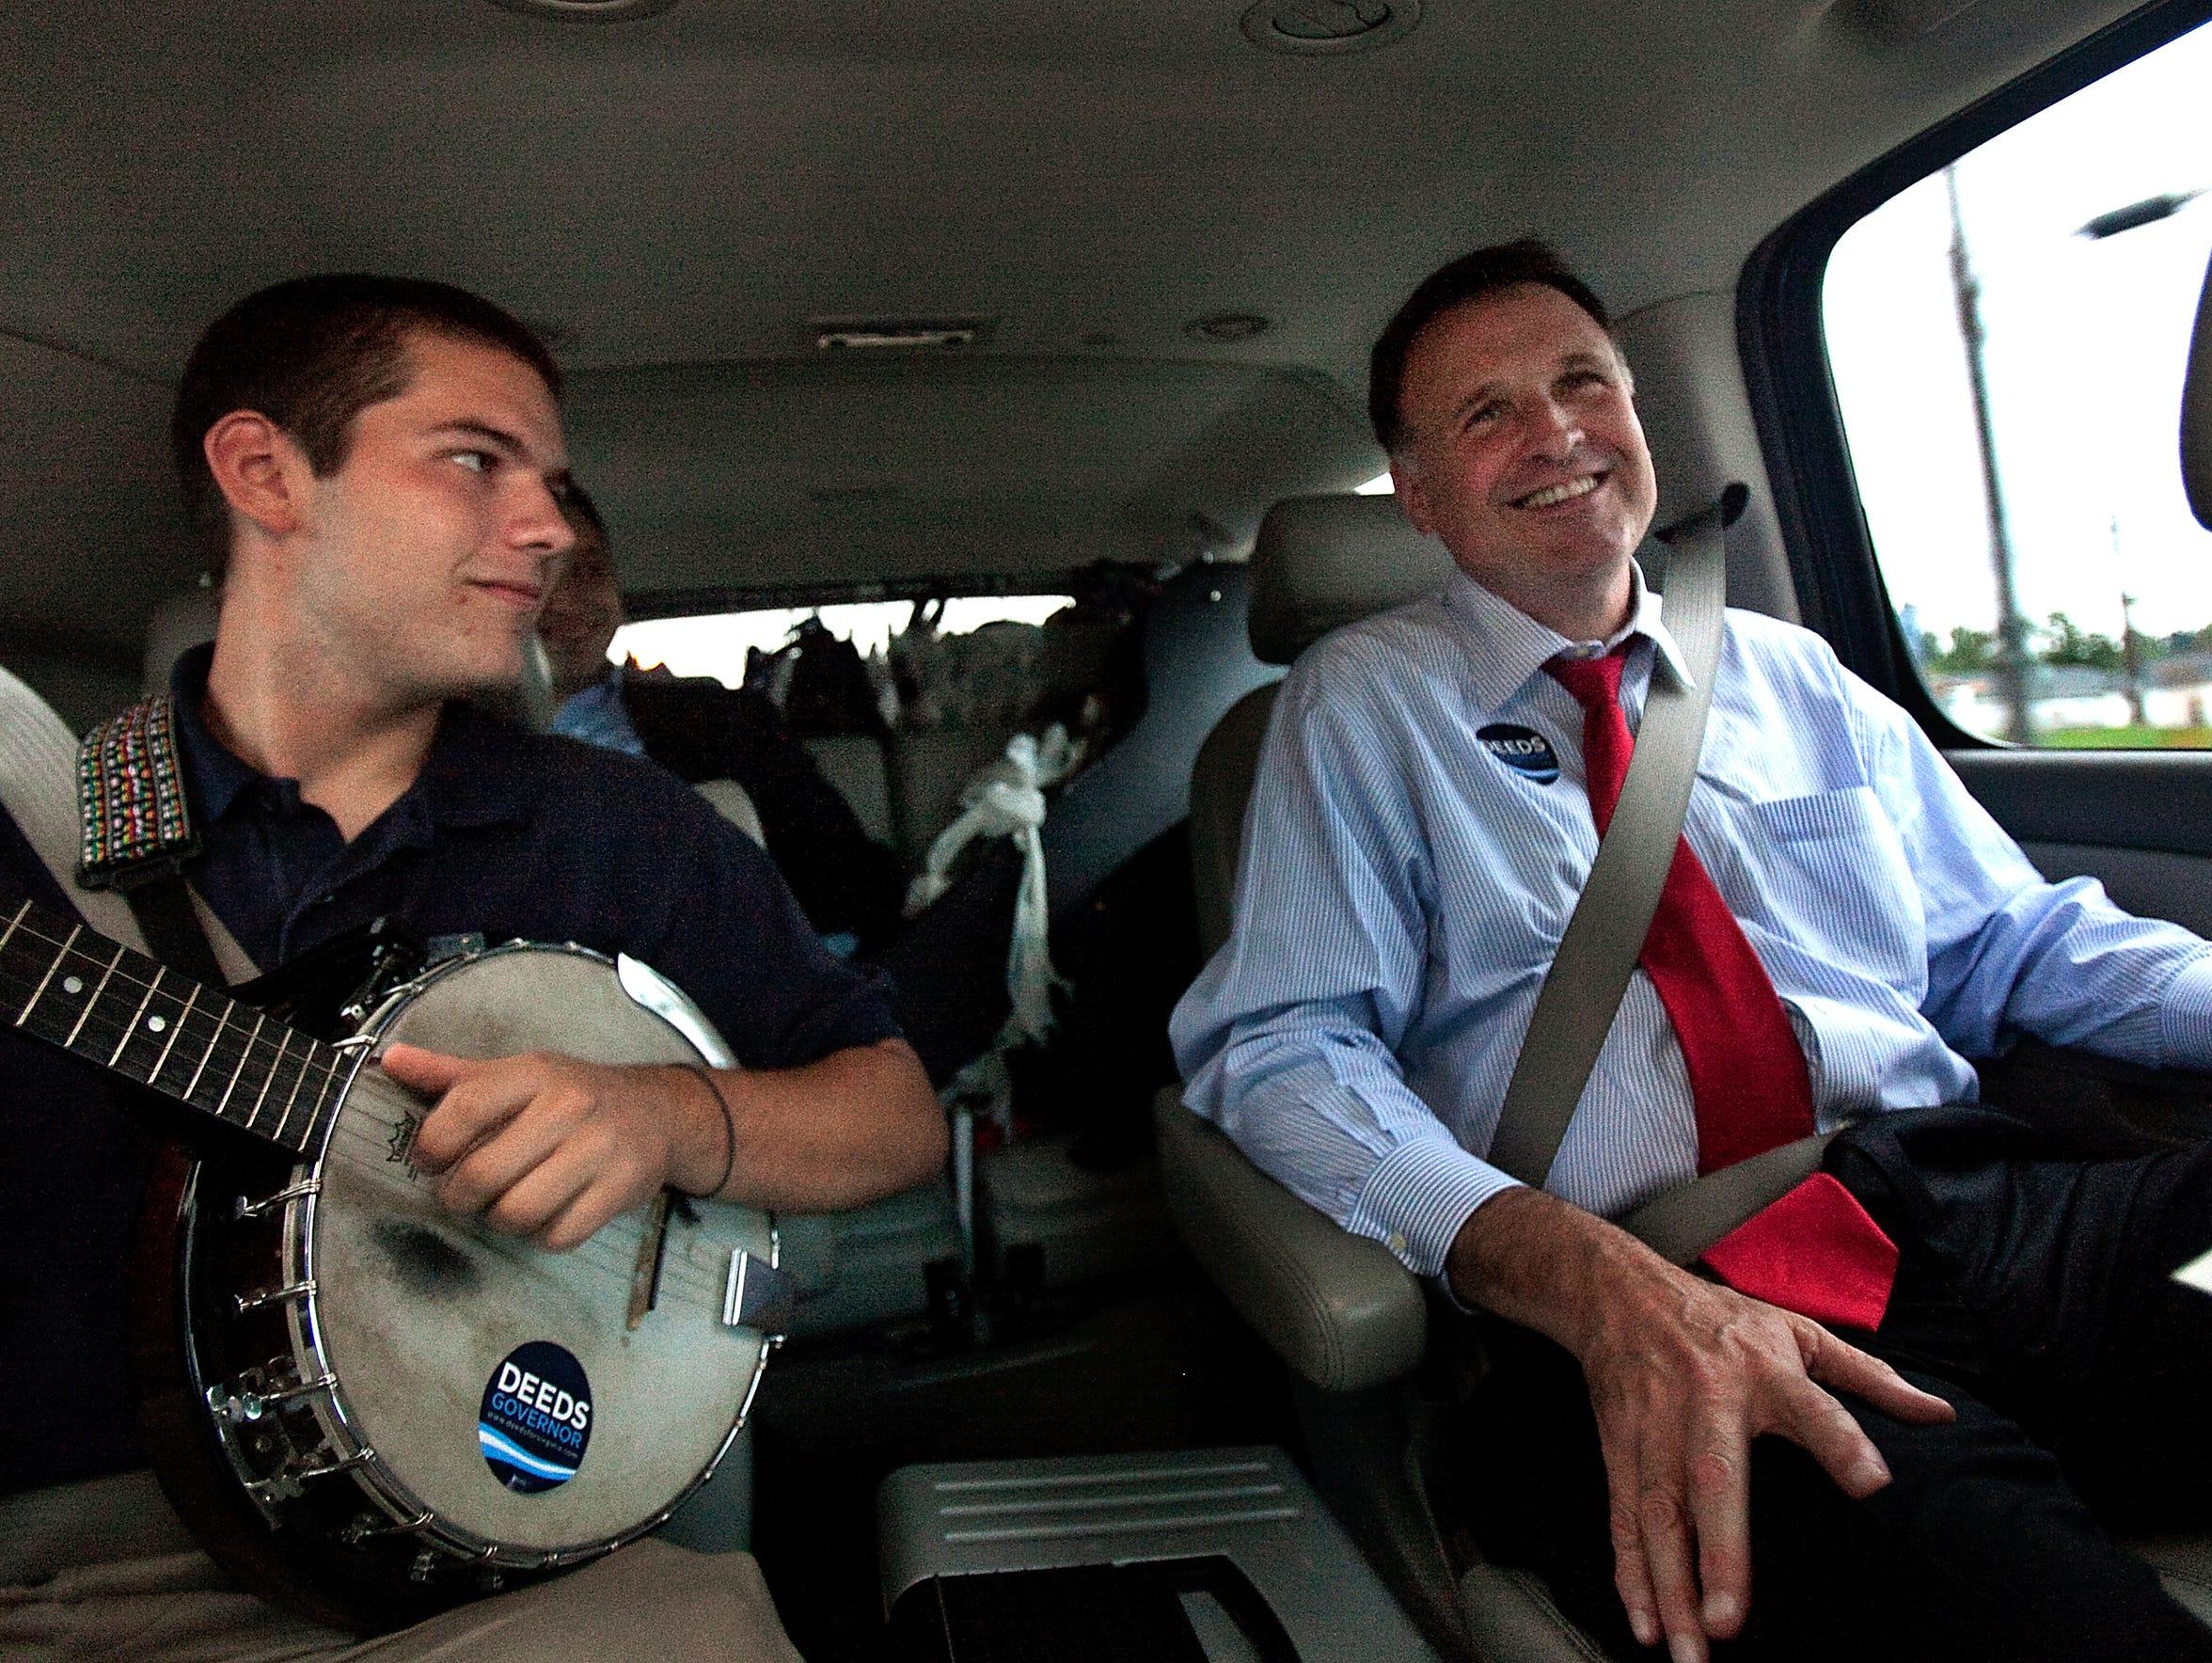 In a Sept. 25, 2009, photo, Democratic gubernatorial